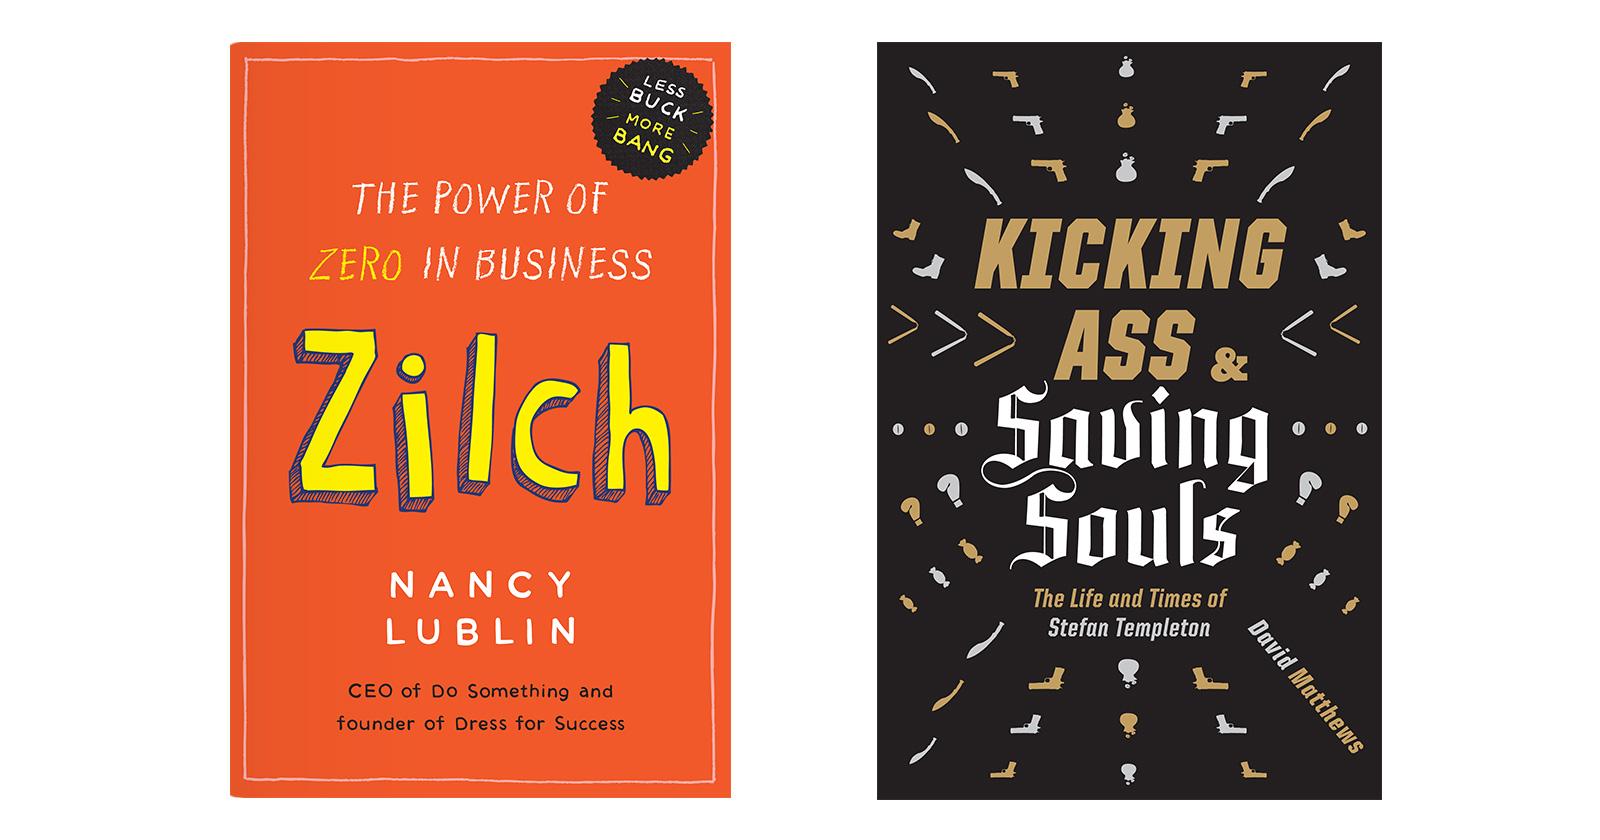 Book-covers-1.jpg